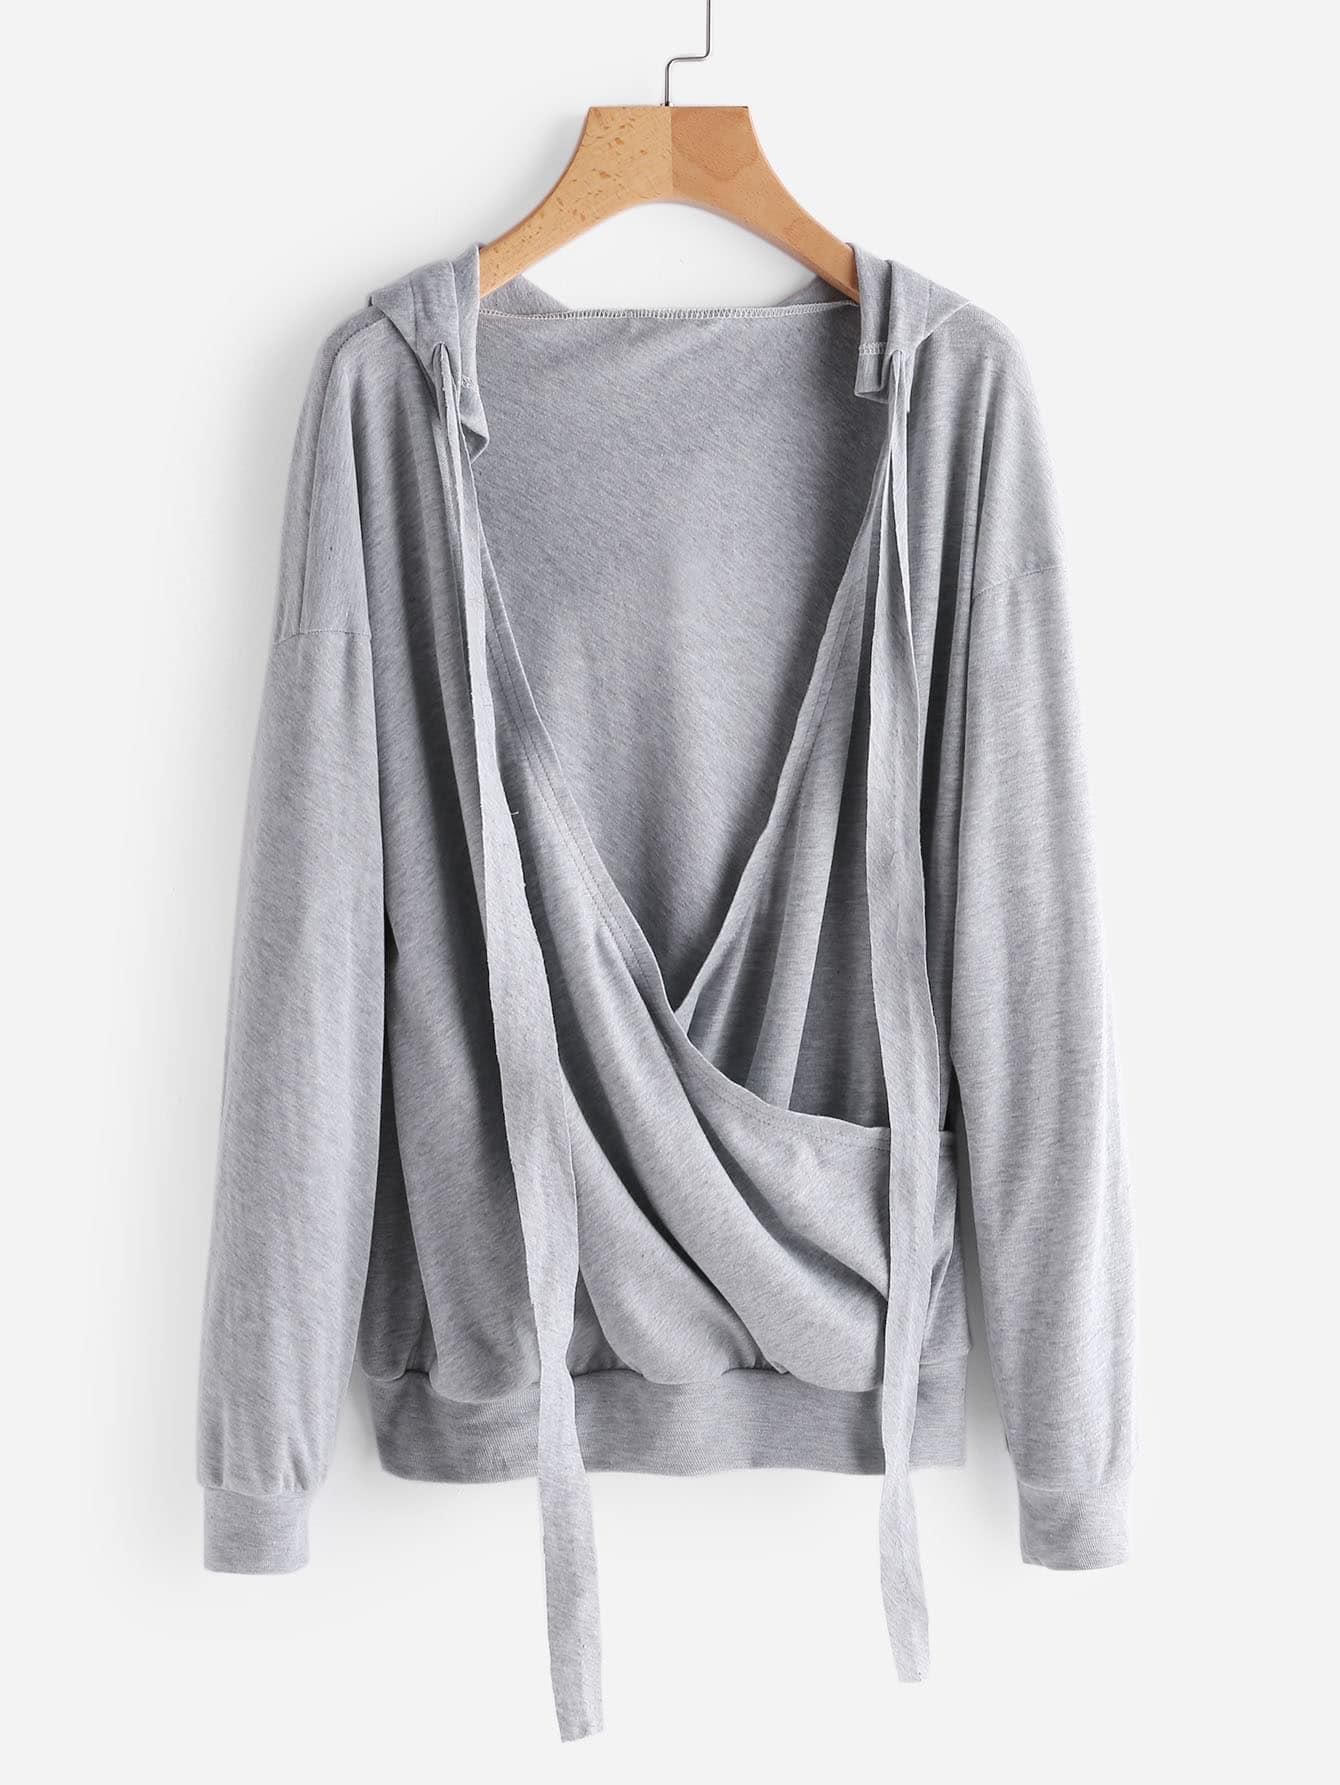 Drop Shoulder Surplice Marled Hoodie drop shoulder marled sweatshirt dress with corset belt